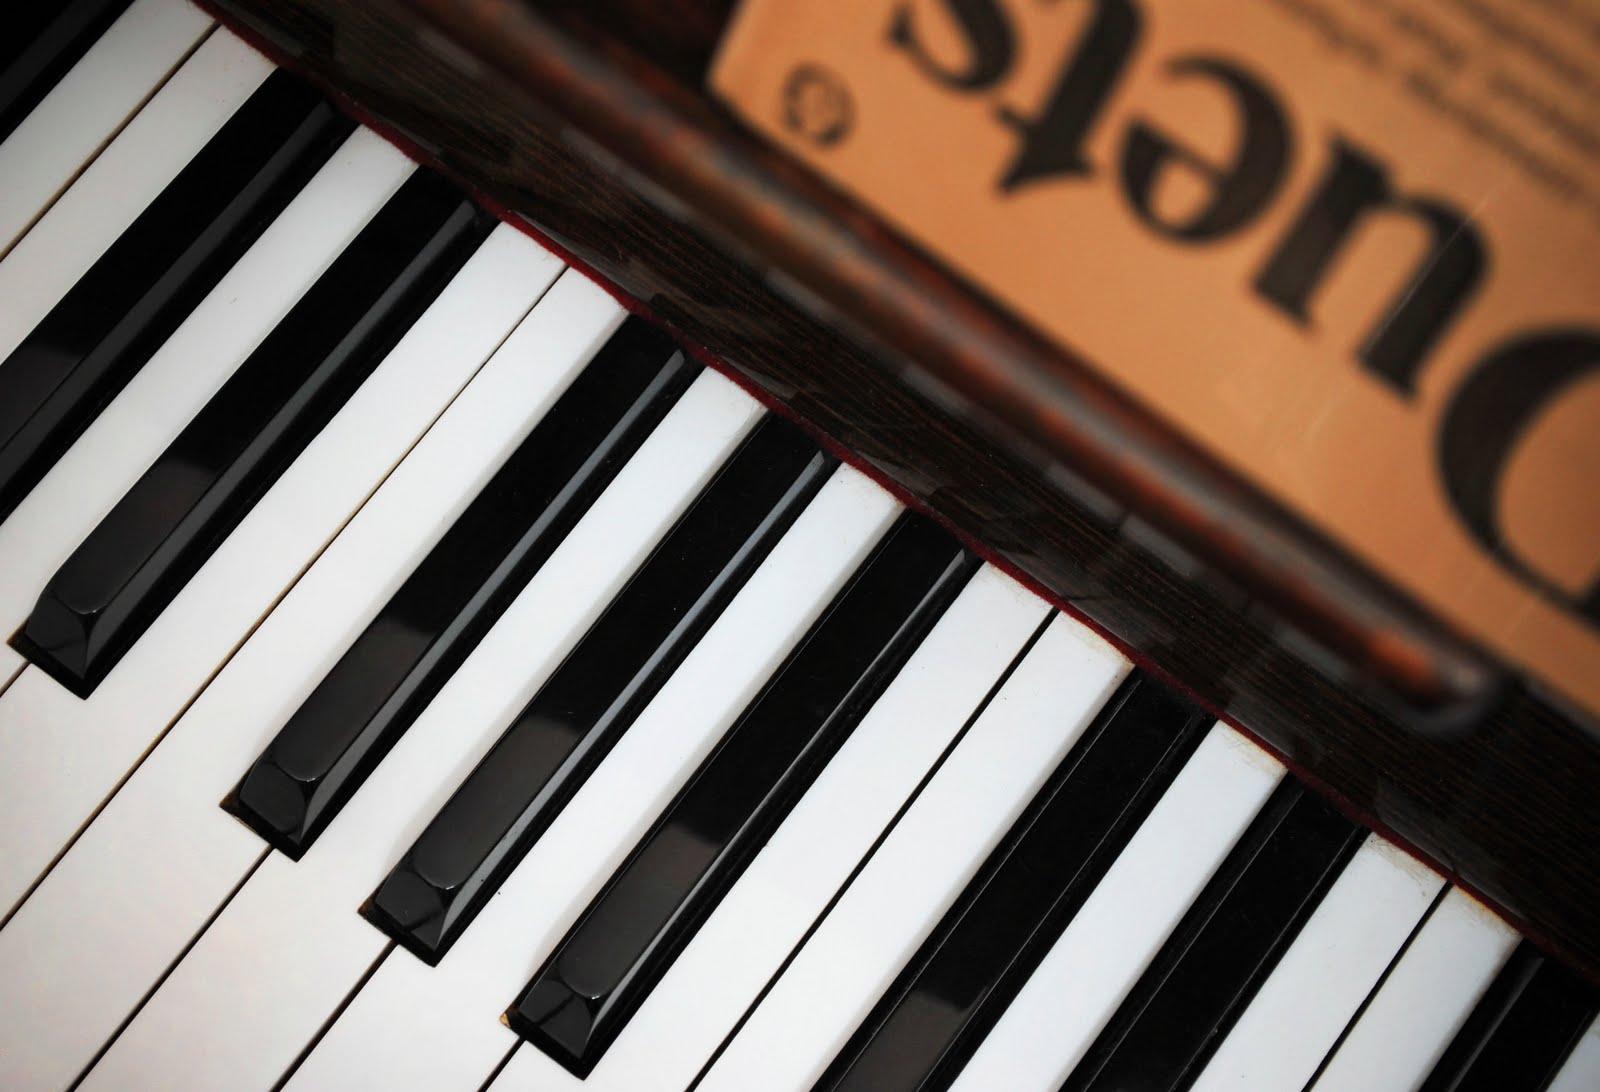 [The+Piano.jpg]